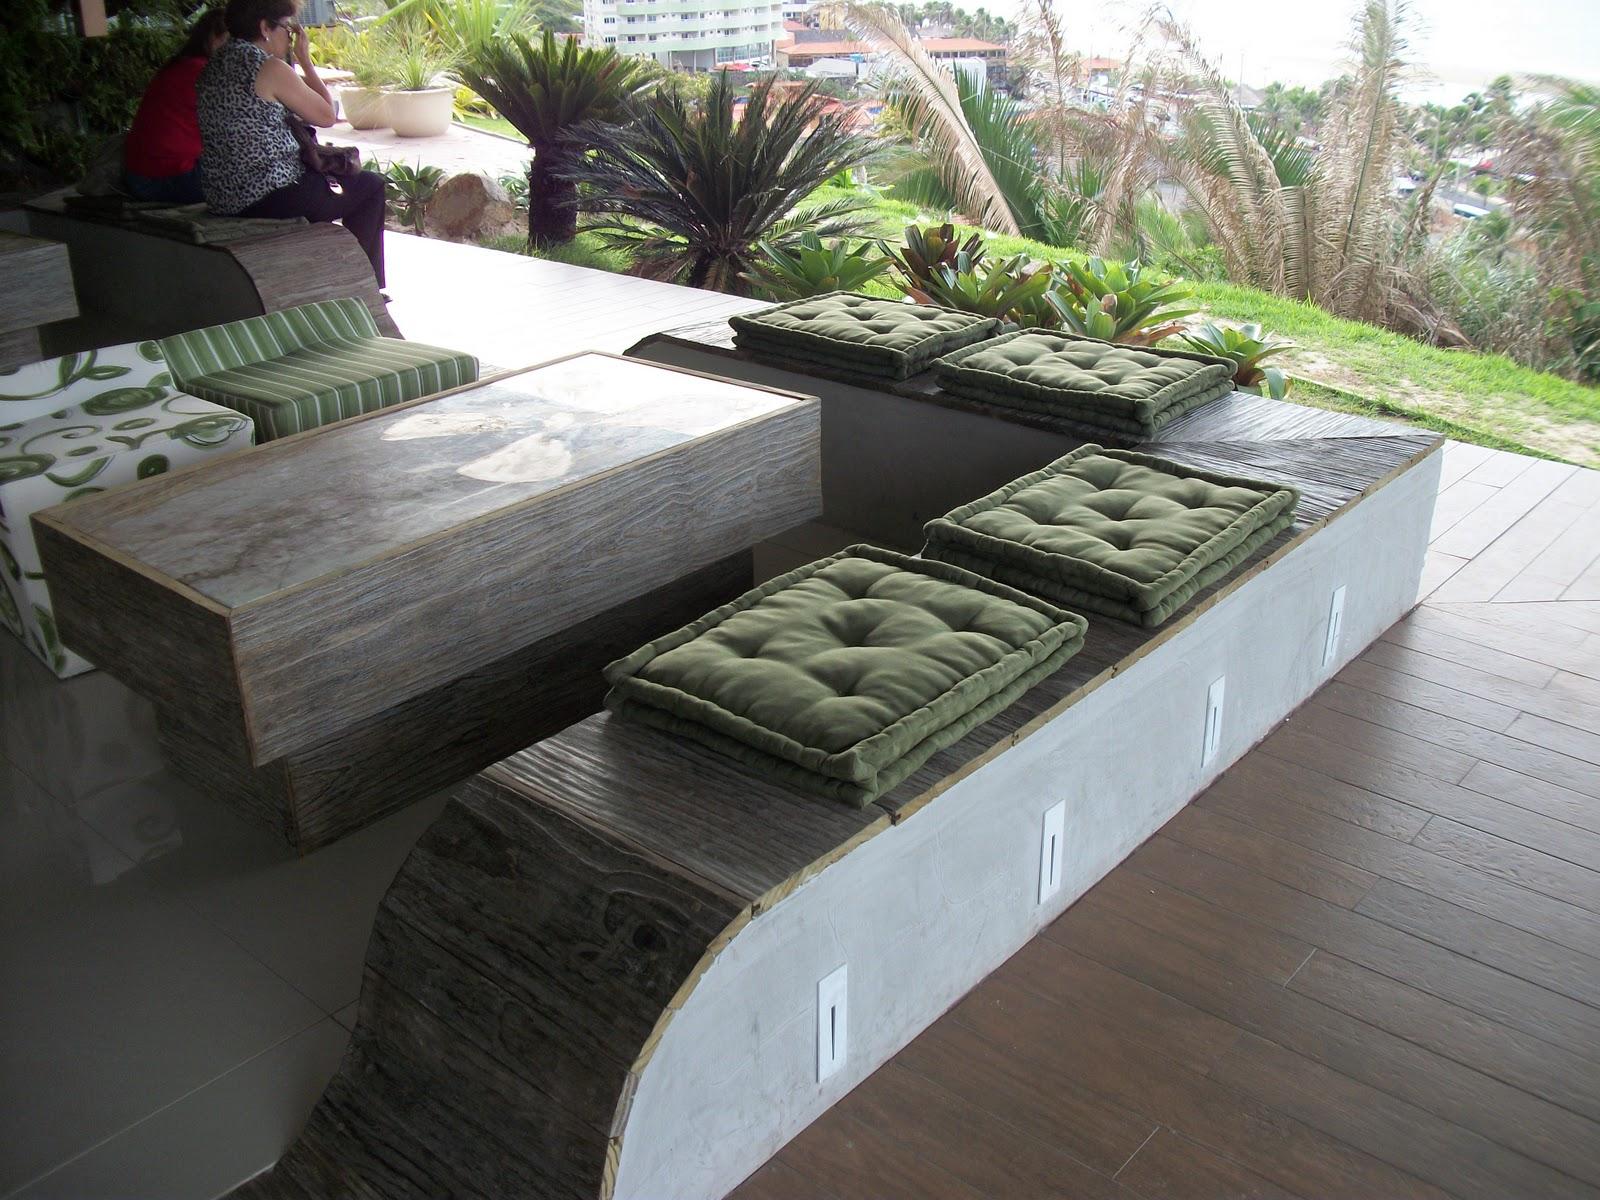 Arquitetando paisagismo e lazer casa cor maranh o - Bancos de cemento ...